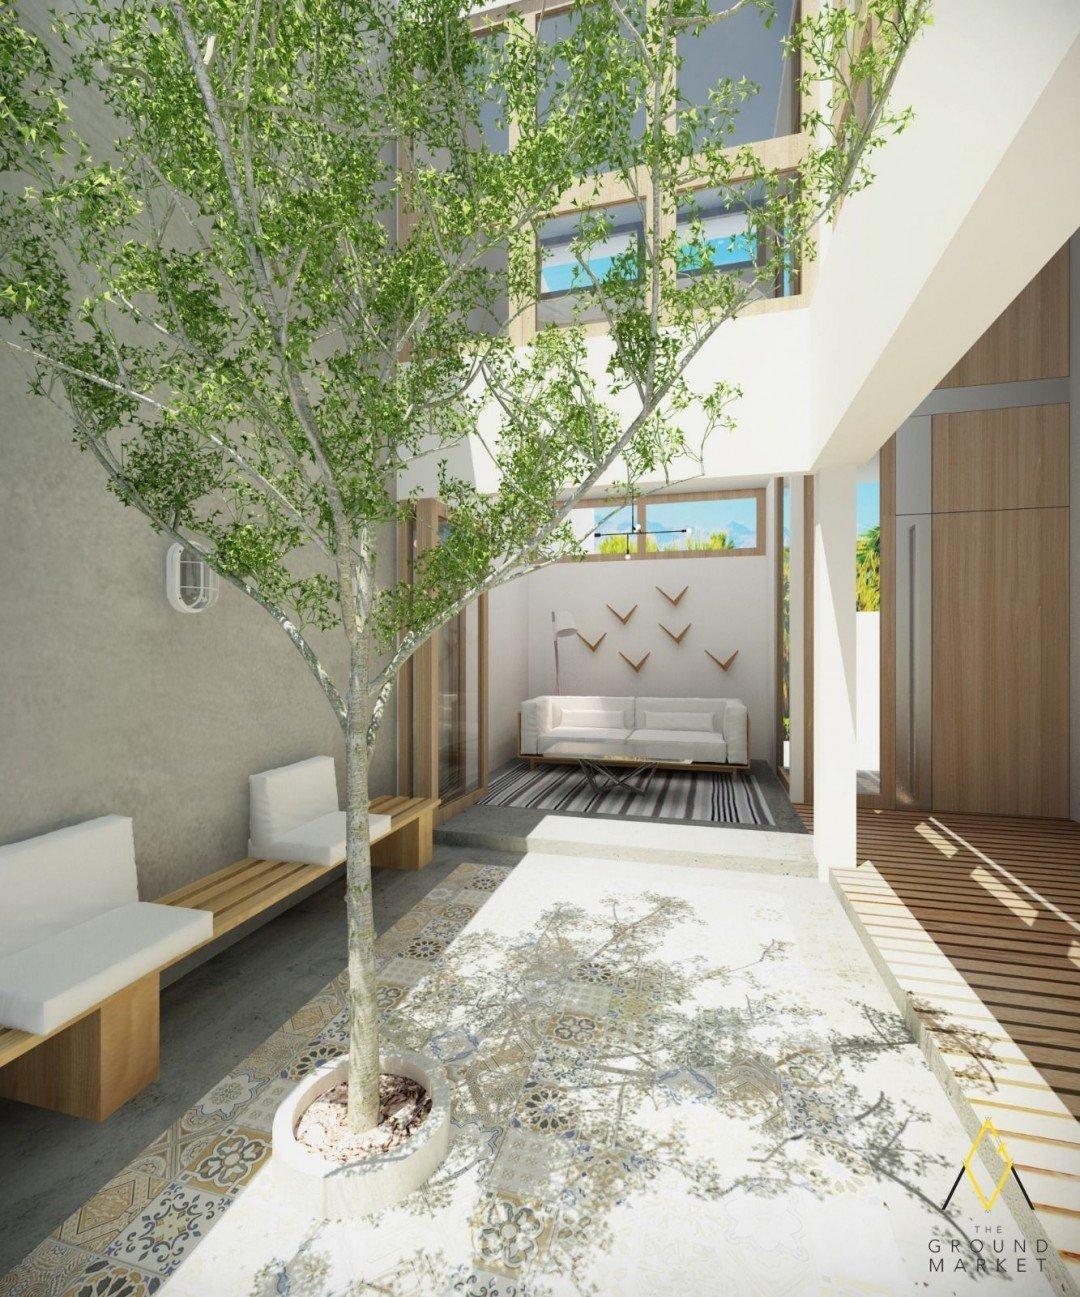 3D Projects | DKI Jakarta | The Ground Market